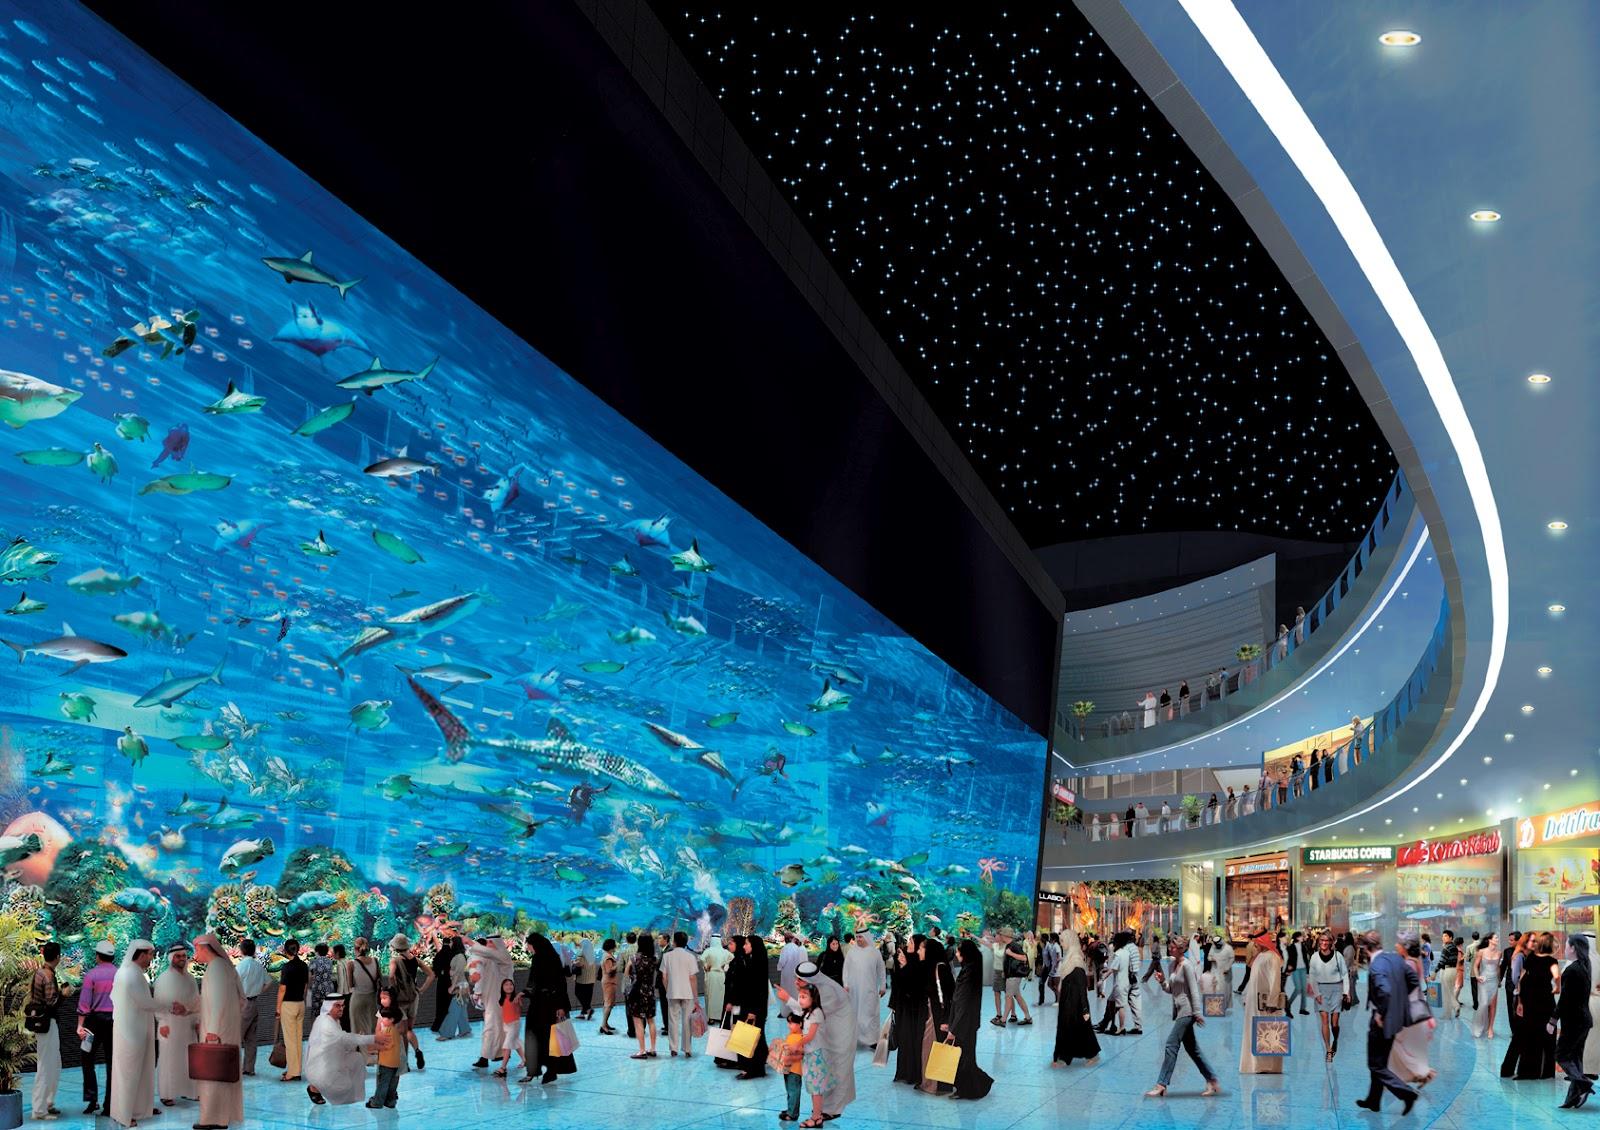 Dubai Aquarium Wallpapers   Wallpapers 1600x1130